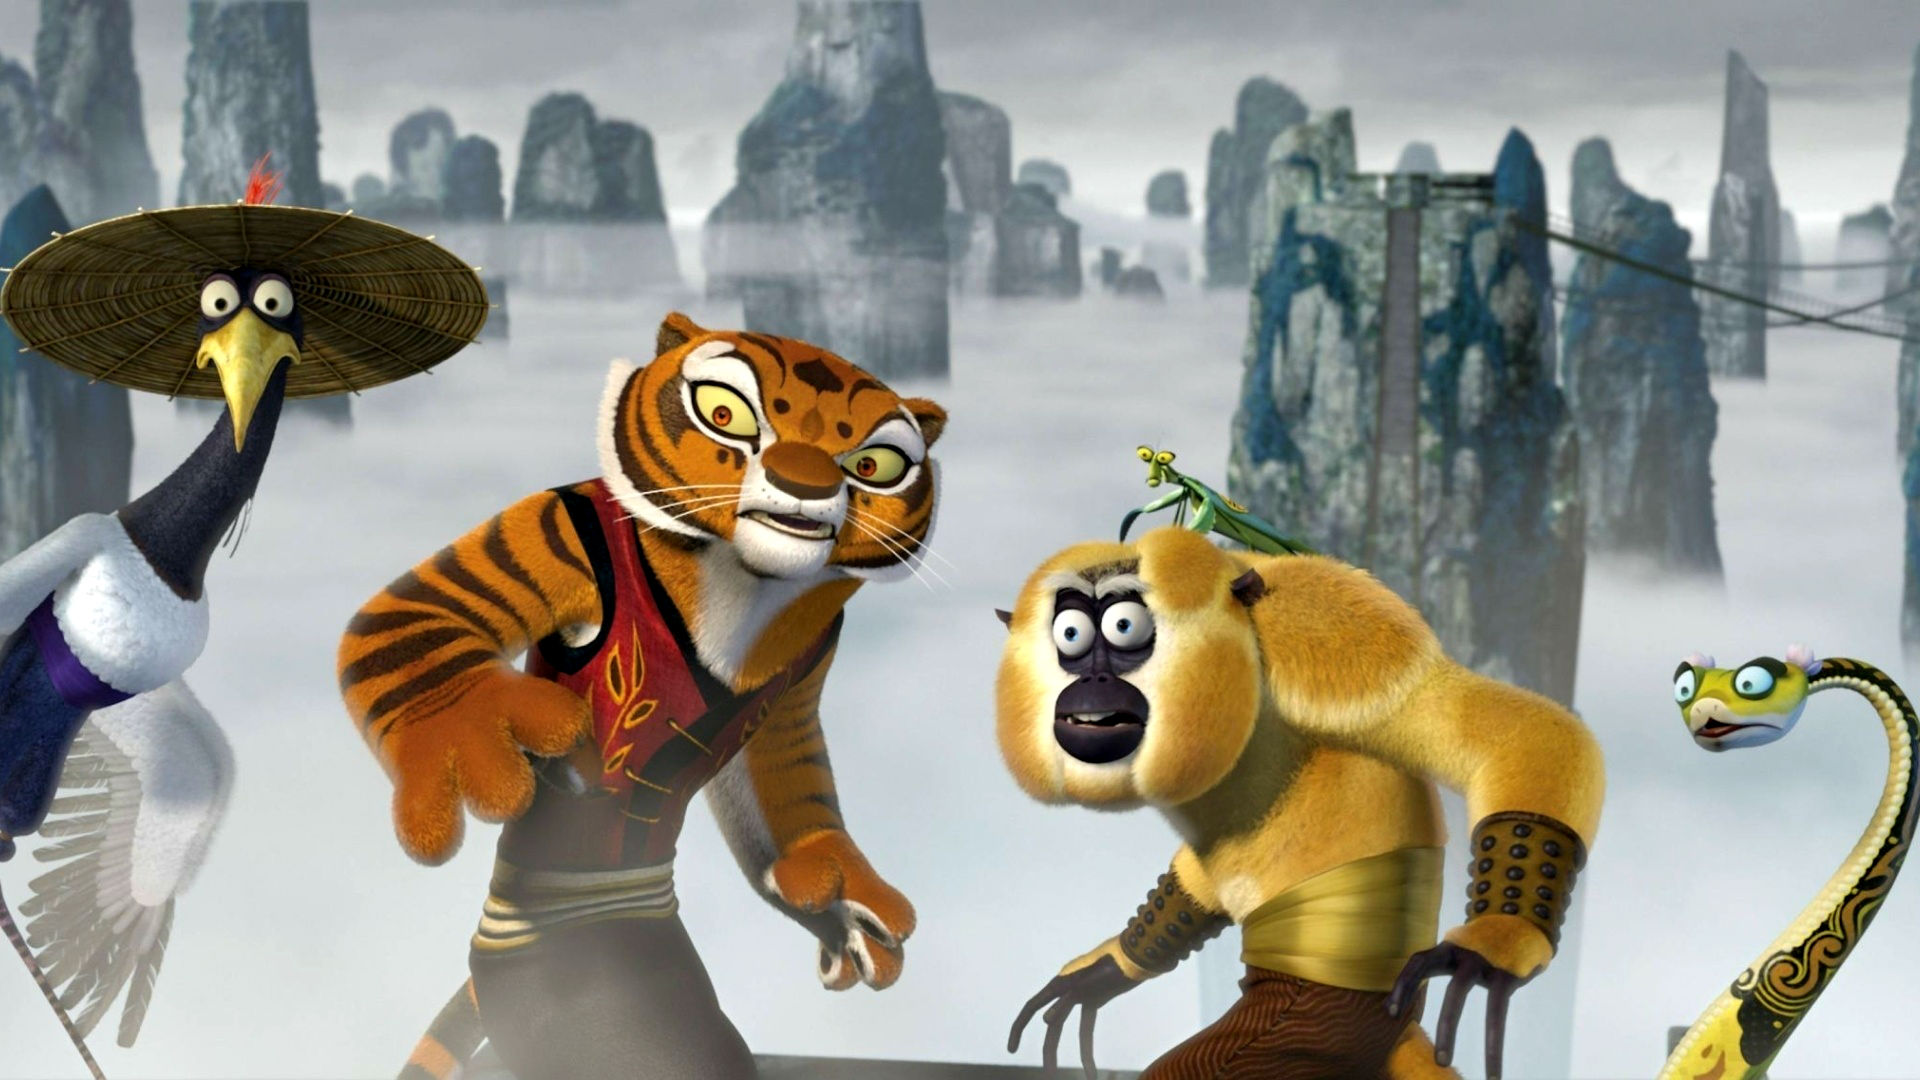 Kung fu panda wallpapers pictures images - Kung fu panda wallpaper ...